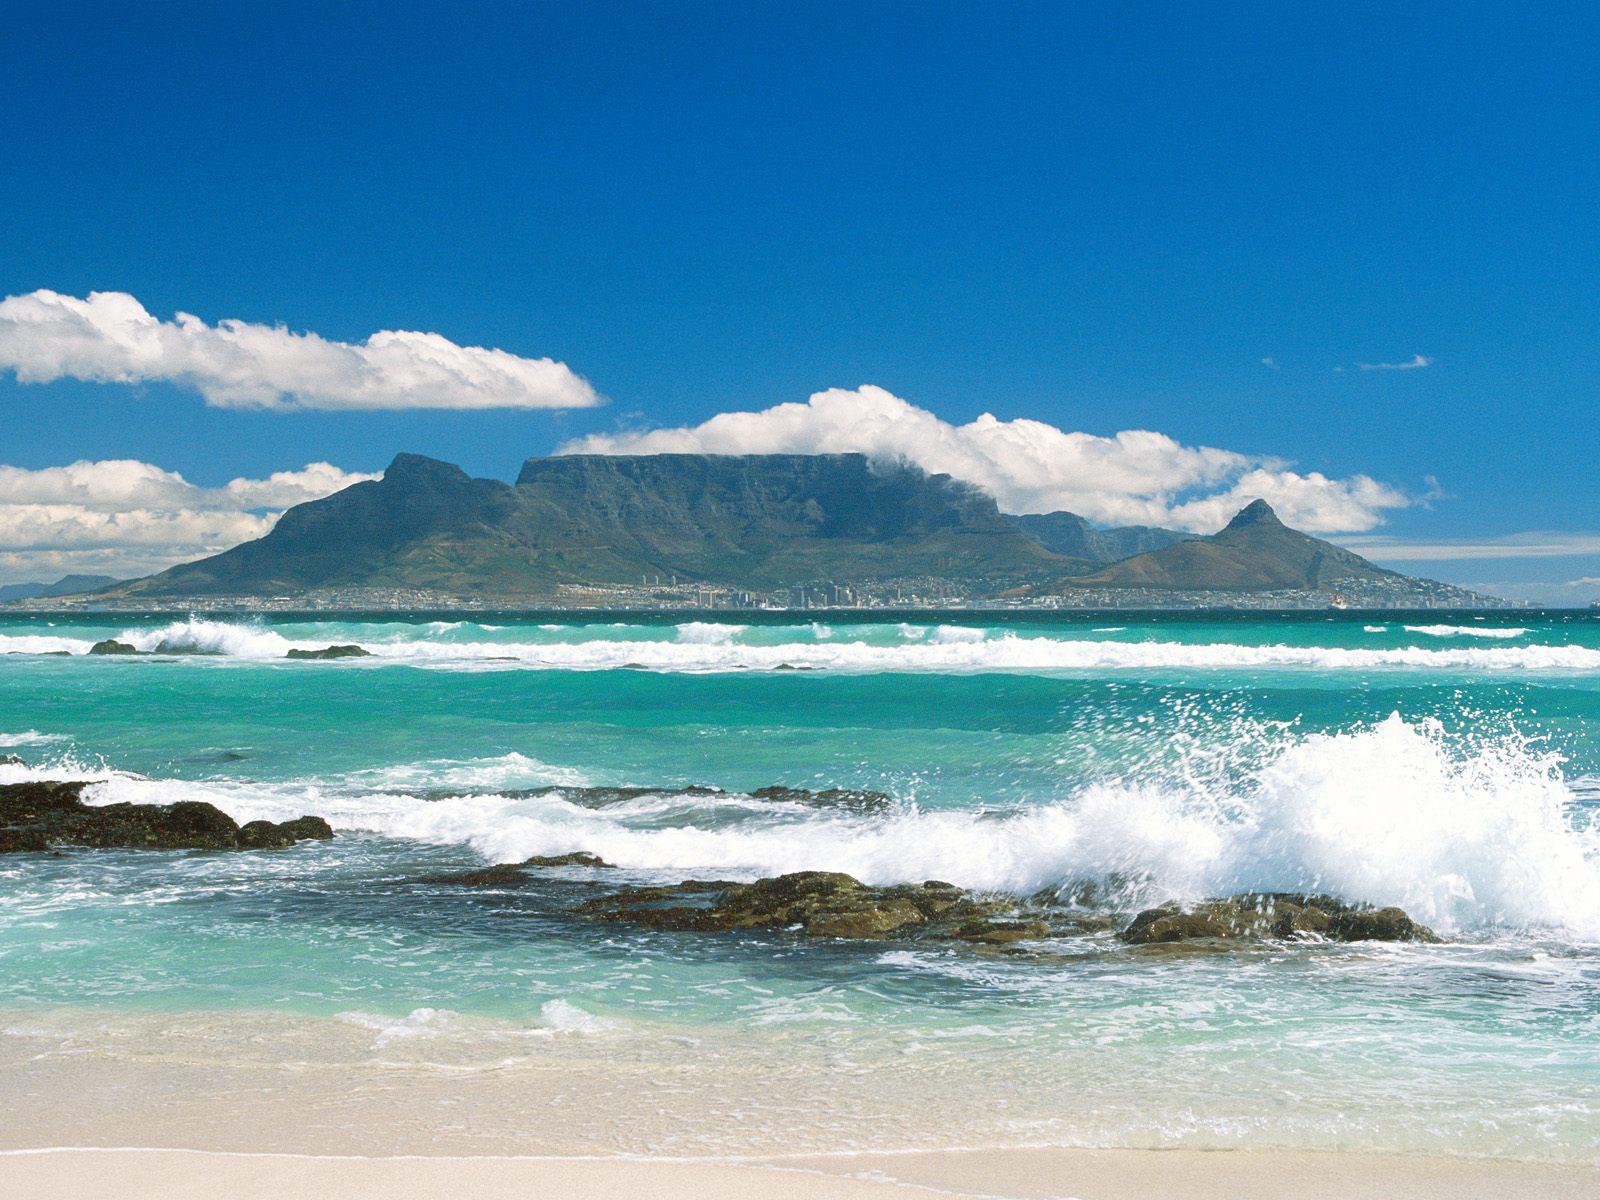 South Africa Beach   1600x1200   43 1600x1200